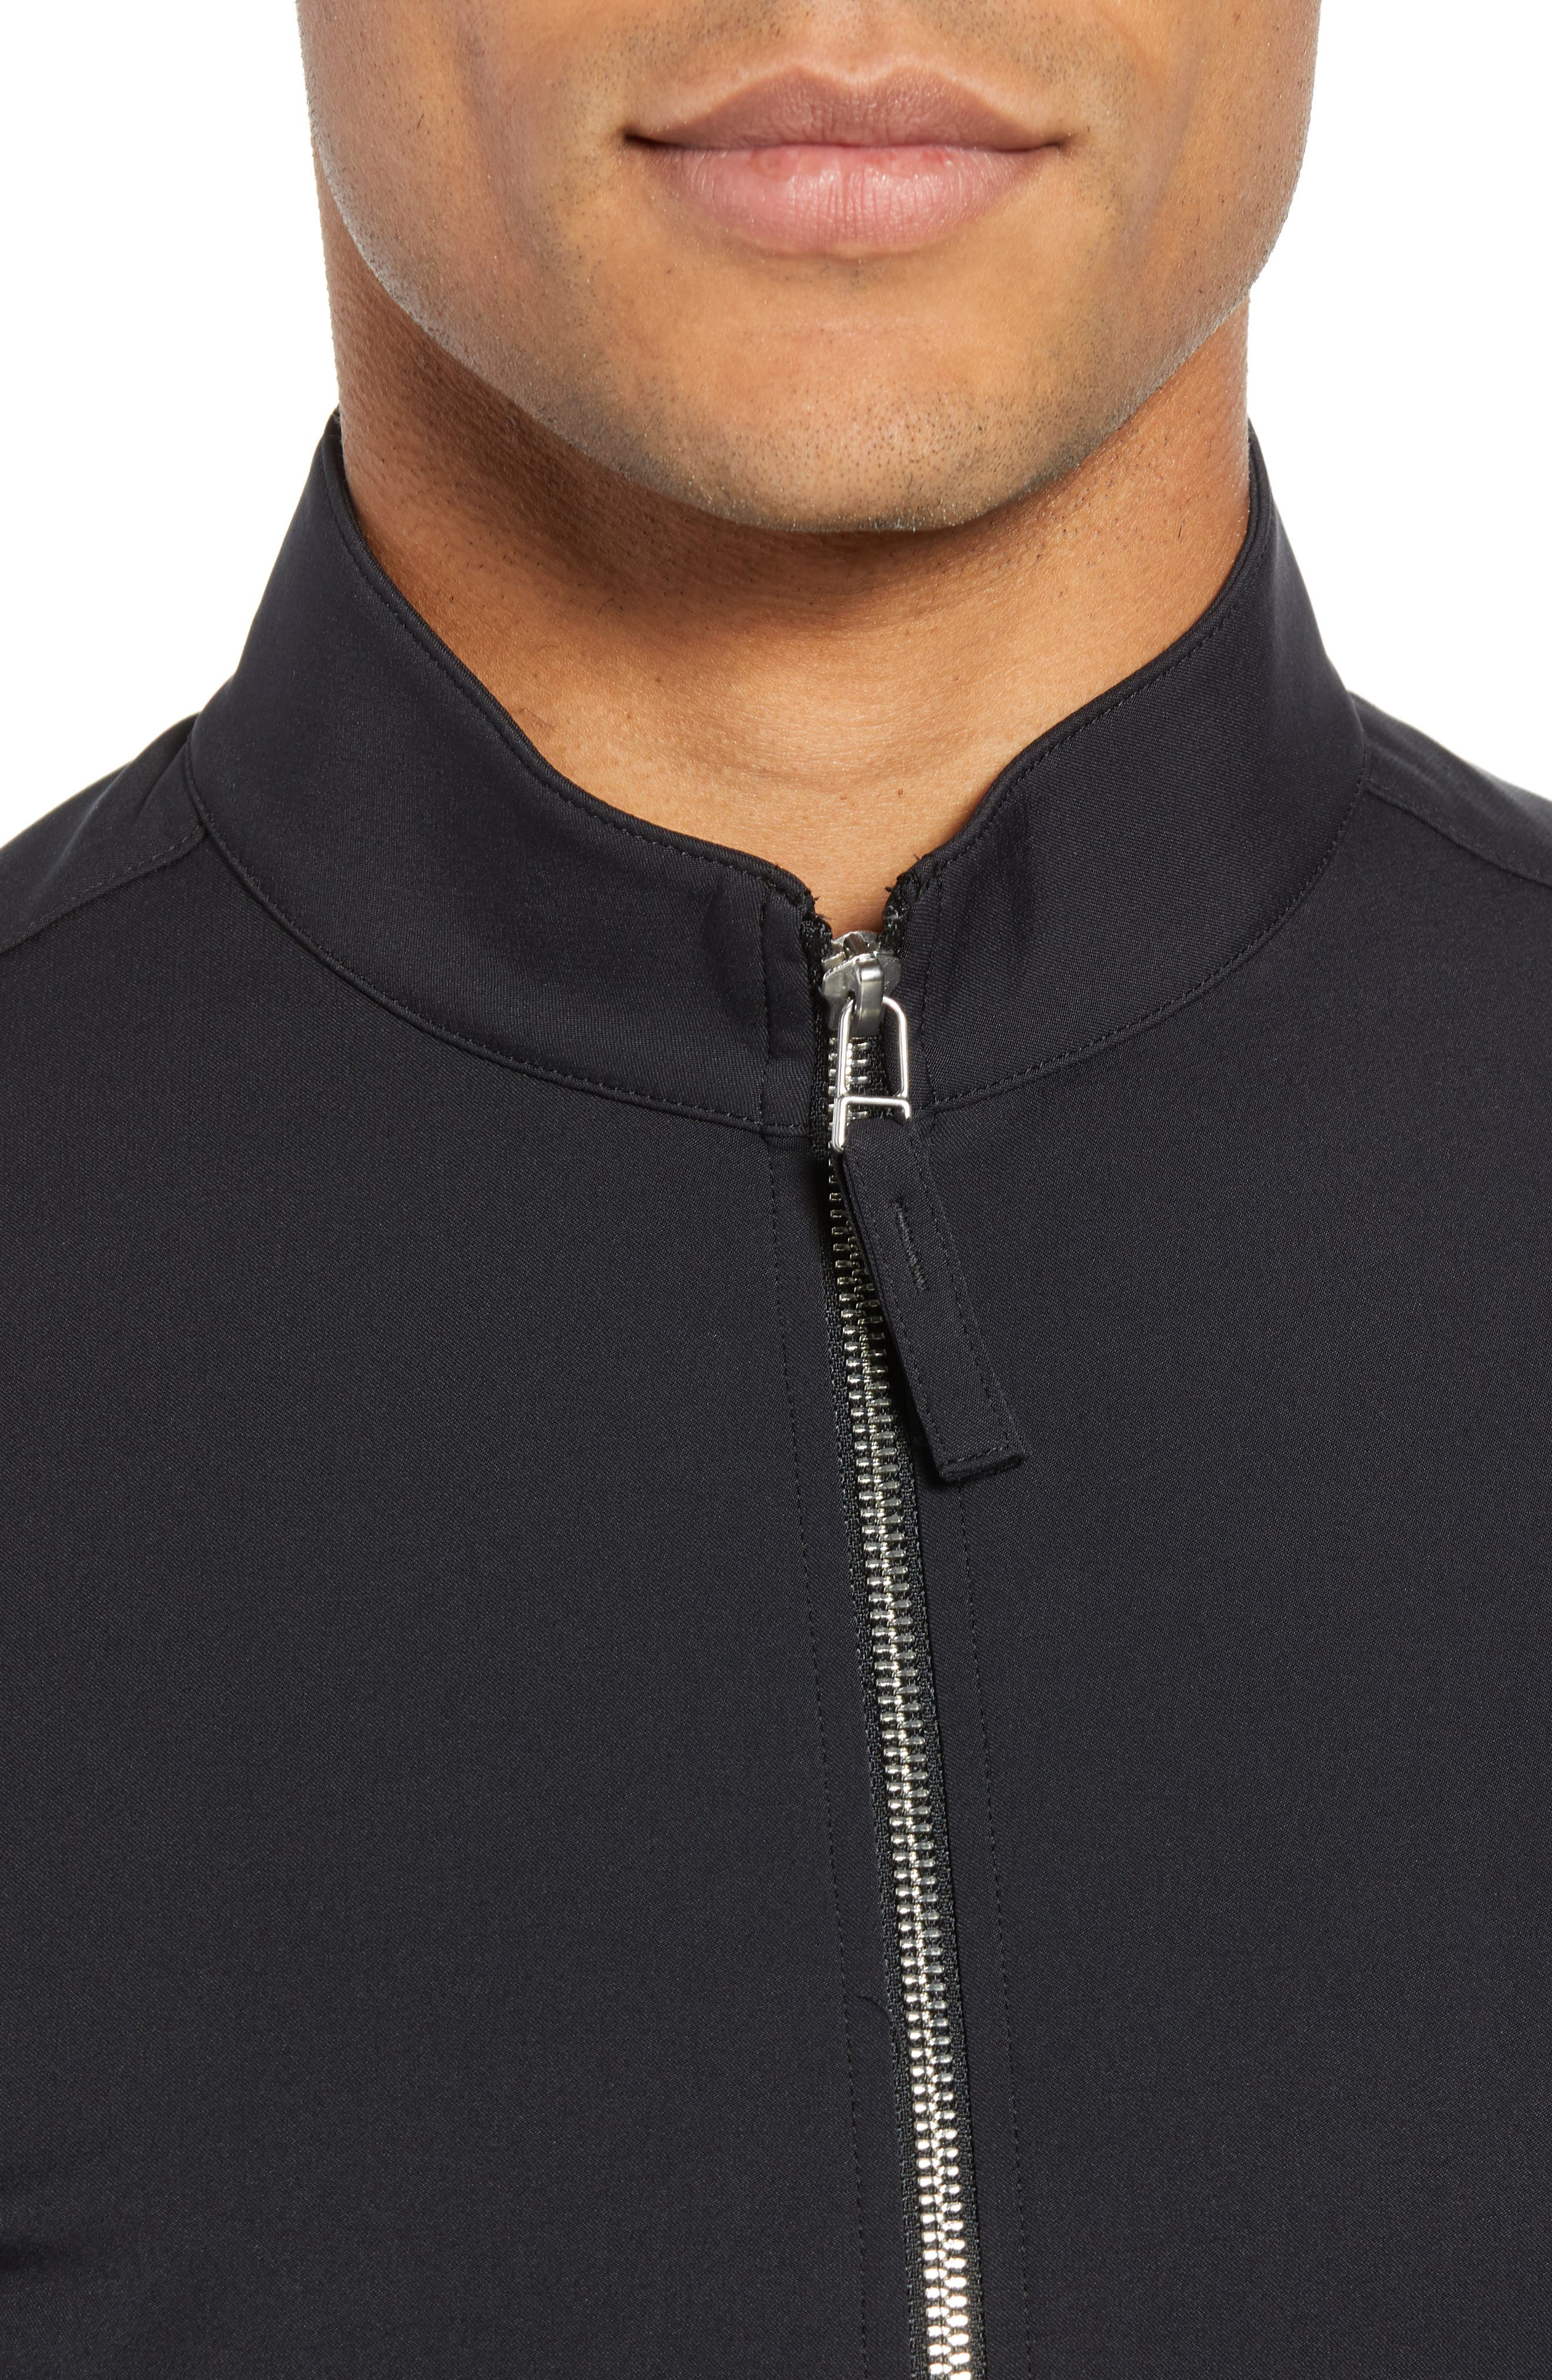 Tremont Neoteric Regular Fit Jacket,                             Alternate thumbnail 4, color,                             BLACK